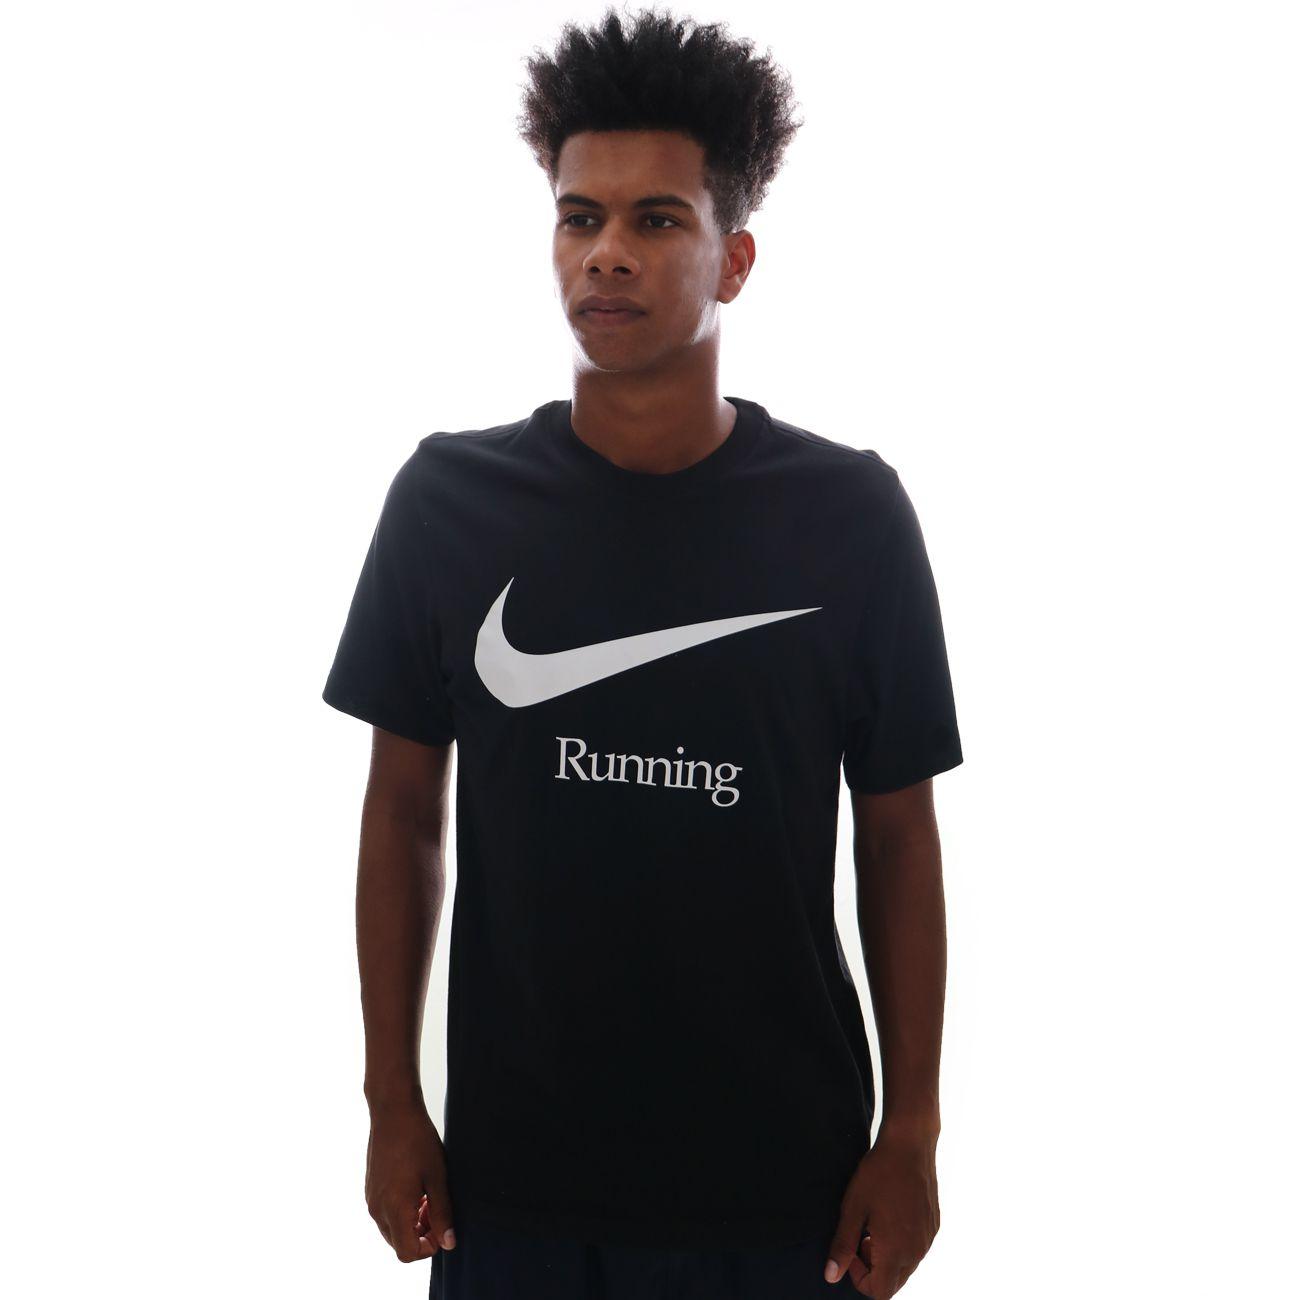 Camiseta Nike Running Dri Fit Preto